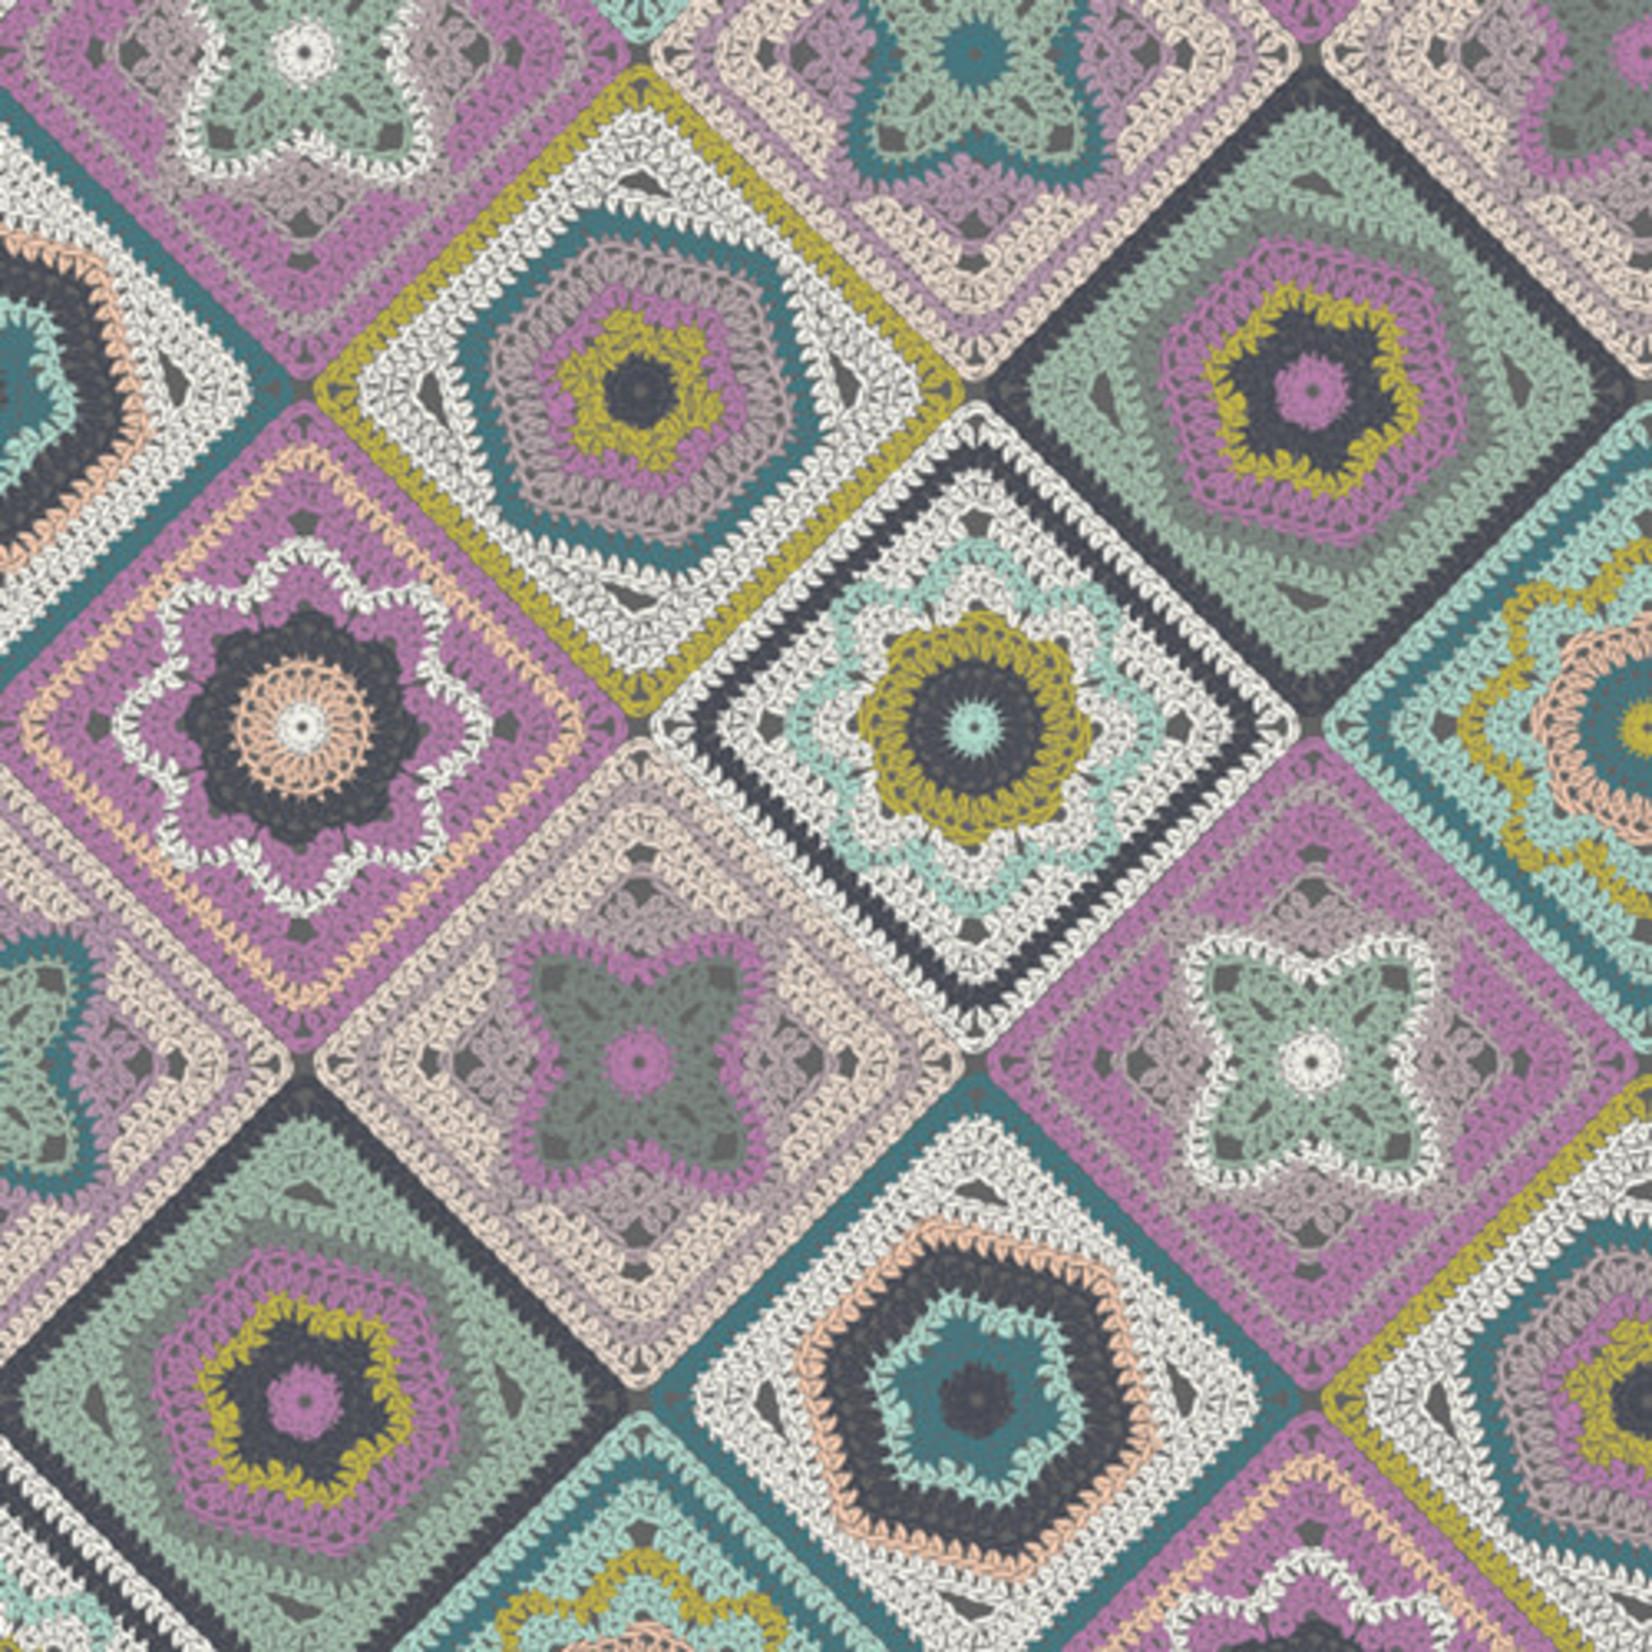 Art Gallery Hooked by Mister Domestic, Crochet Sampler (22650) per cm or $20/m